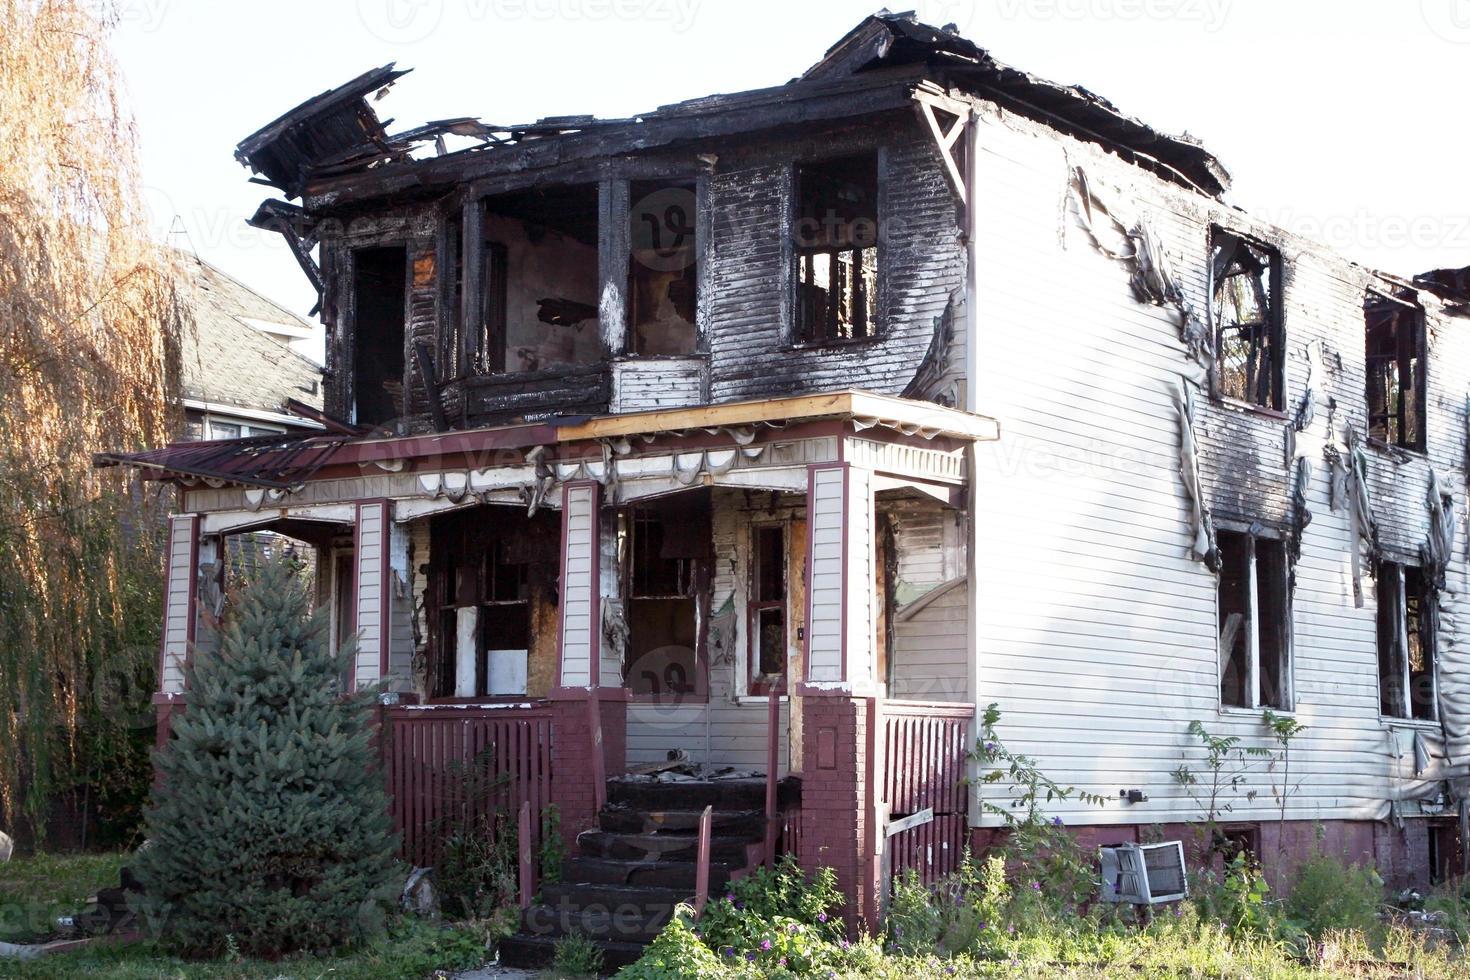 casa danificada pelo fogo foto